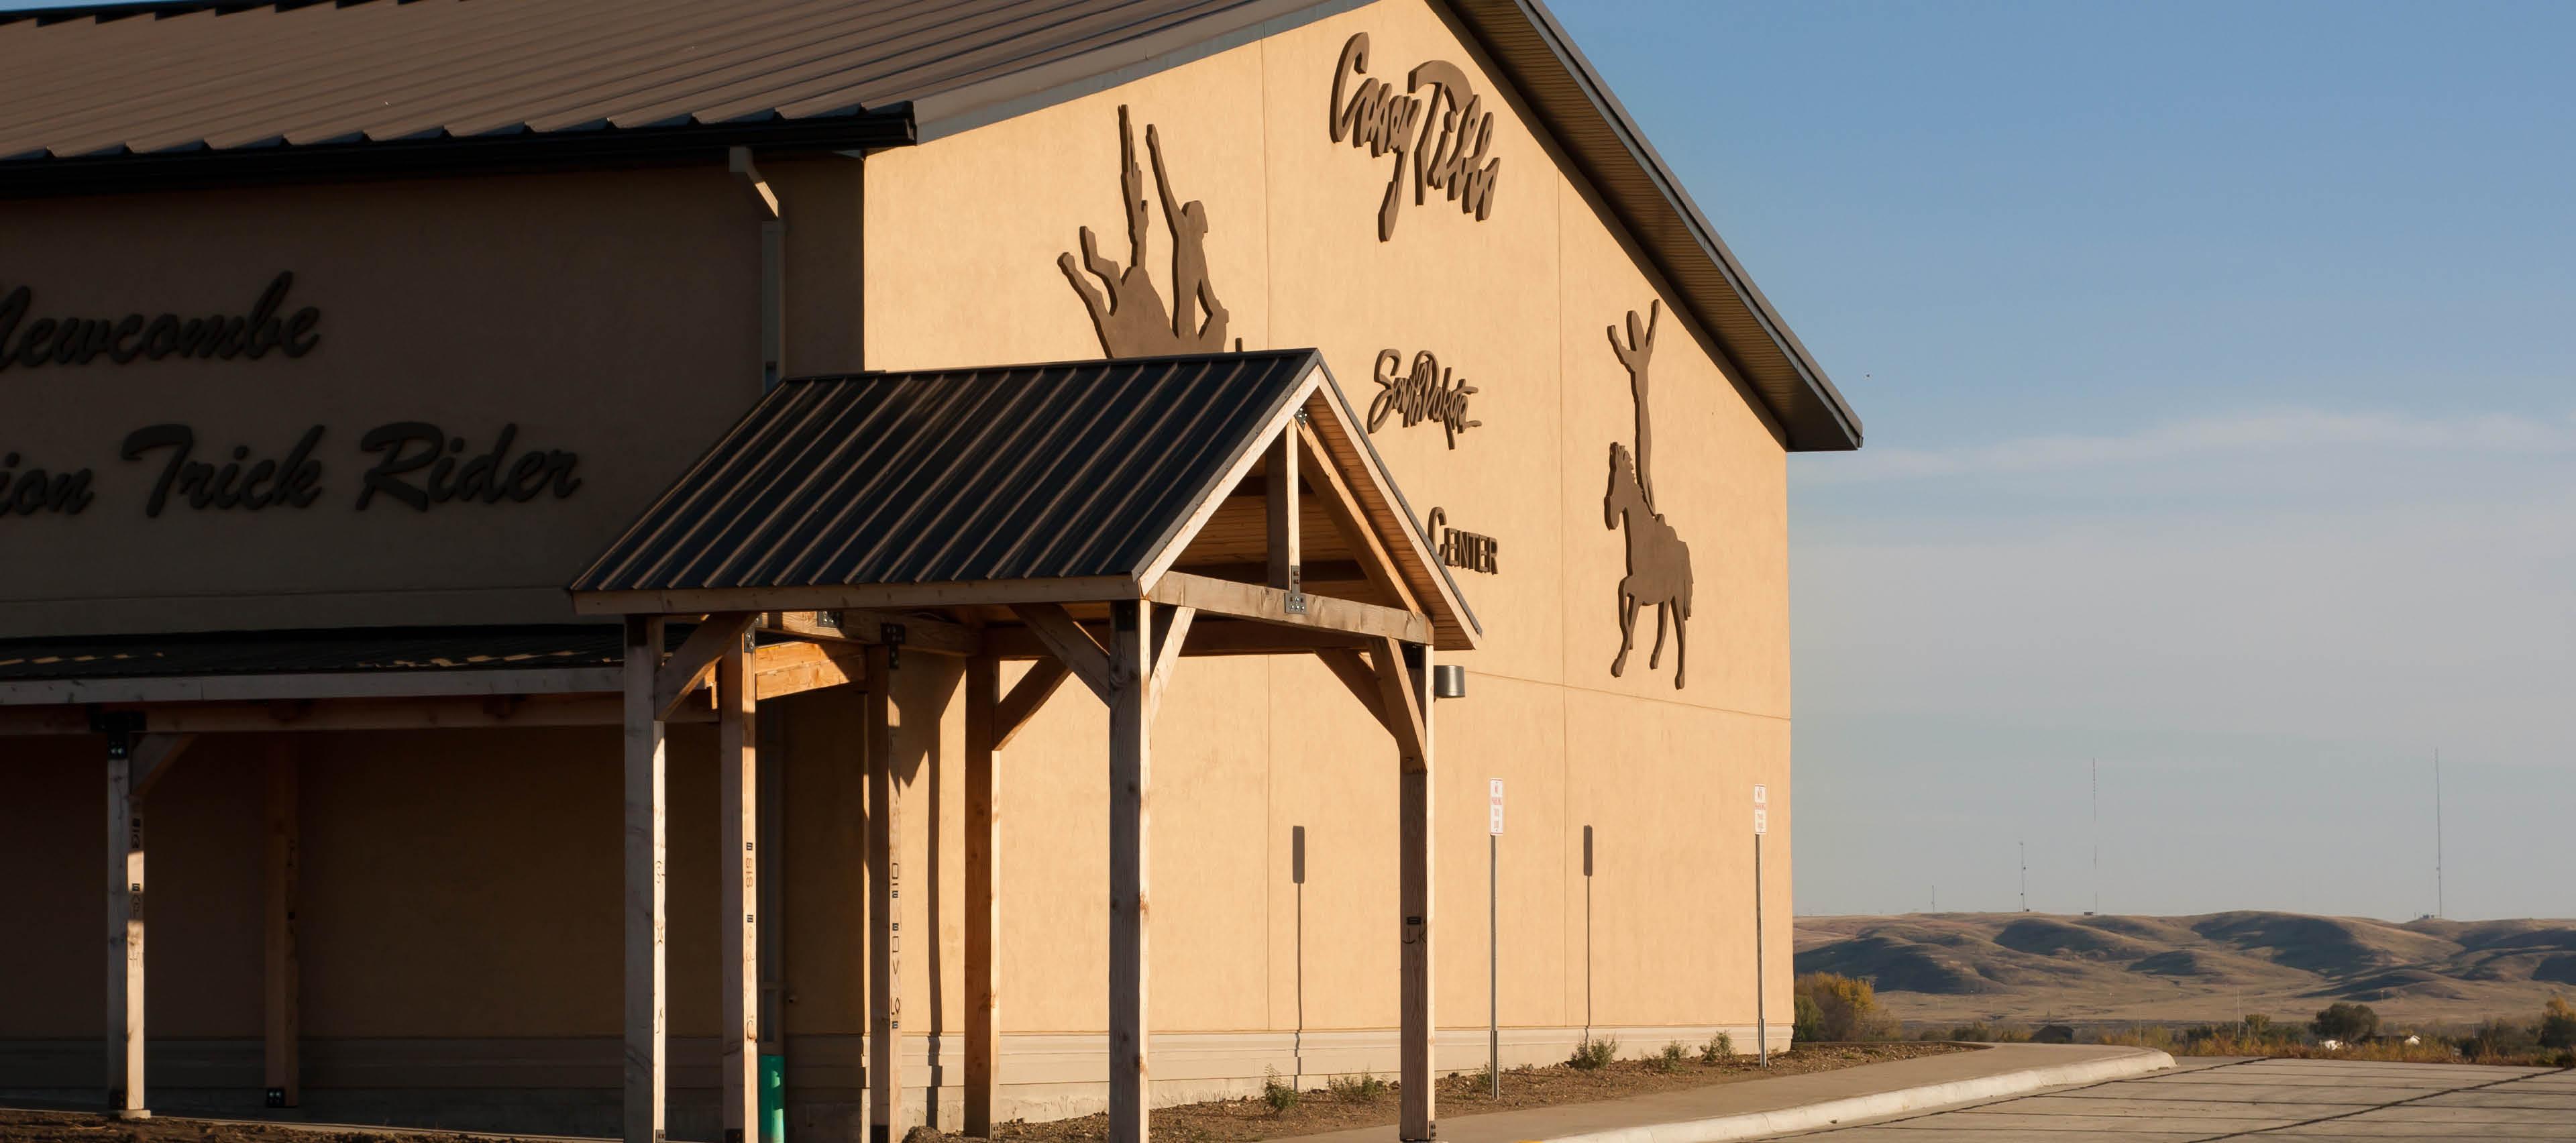 South Dakota Rodeo Center